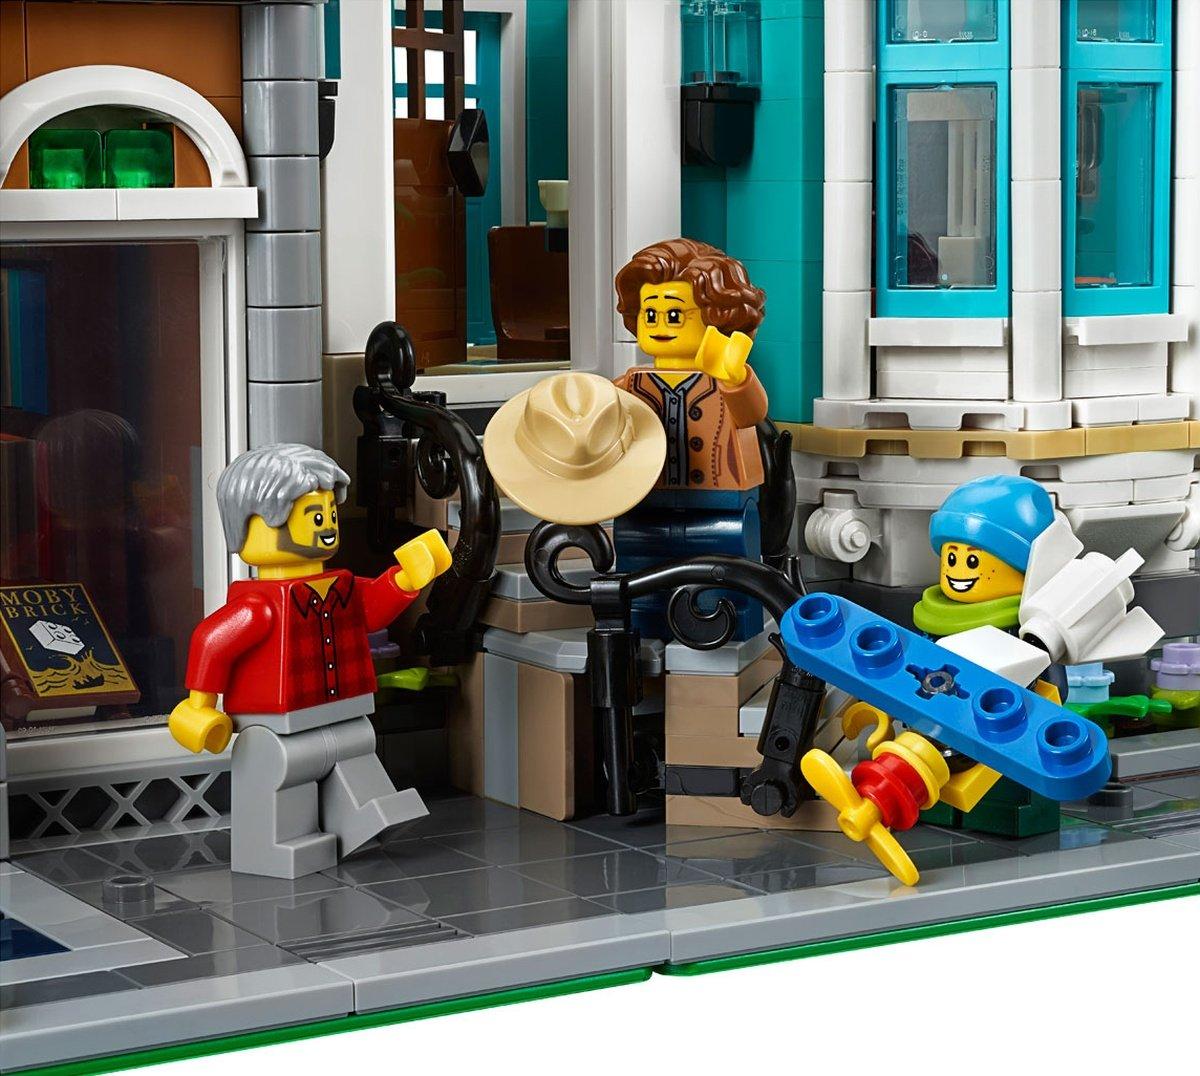 LEGO 10270 Creator Expert Modular Bookshop people